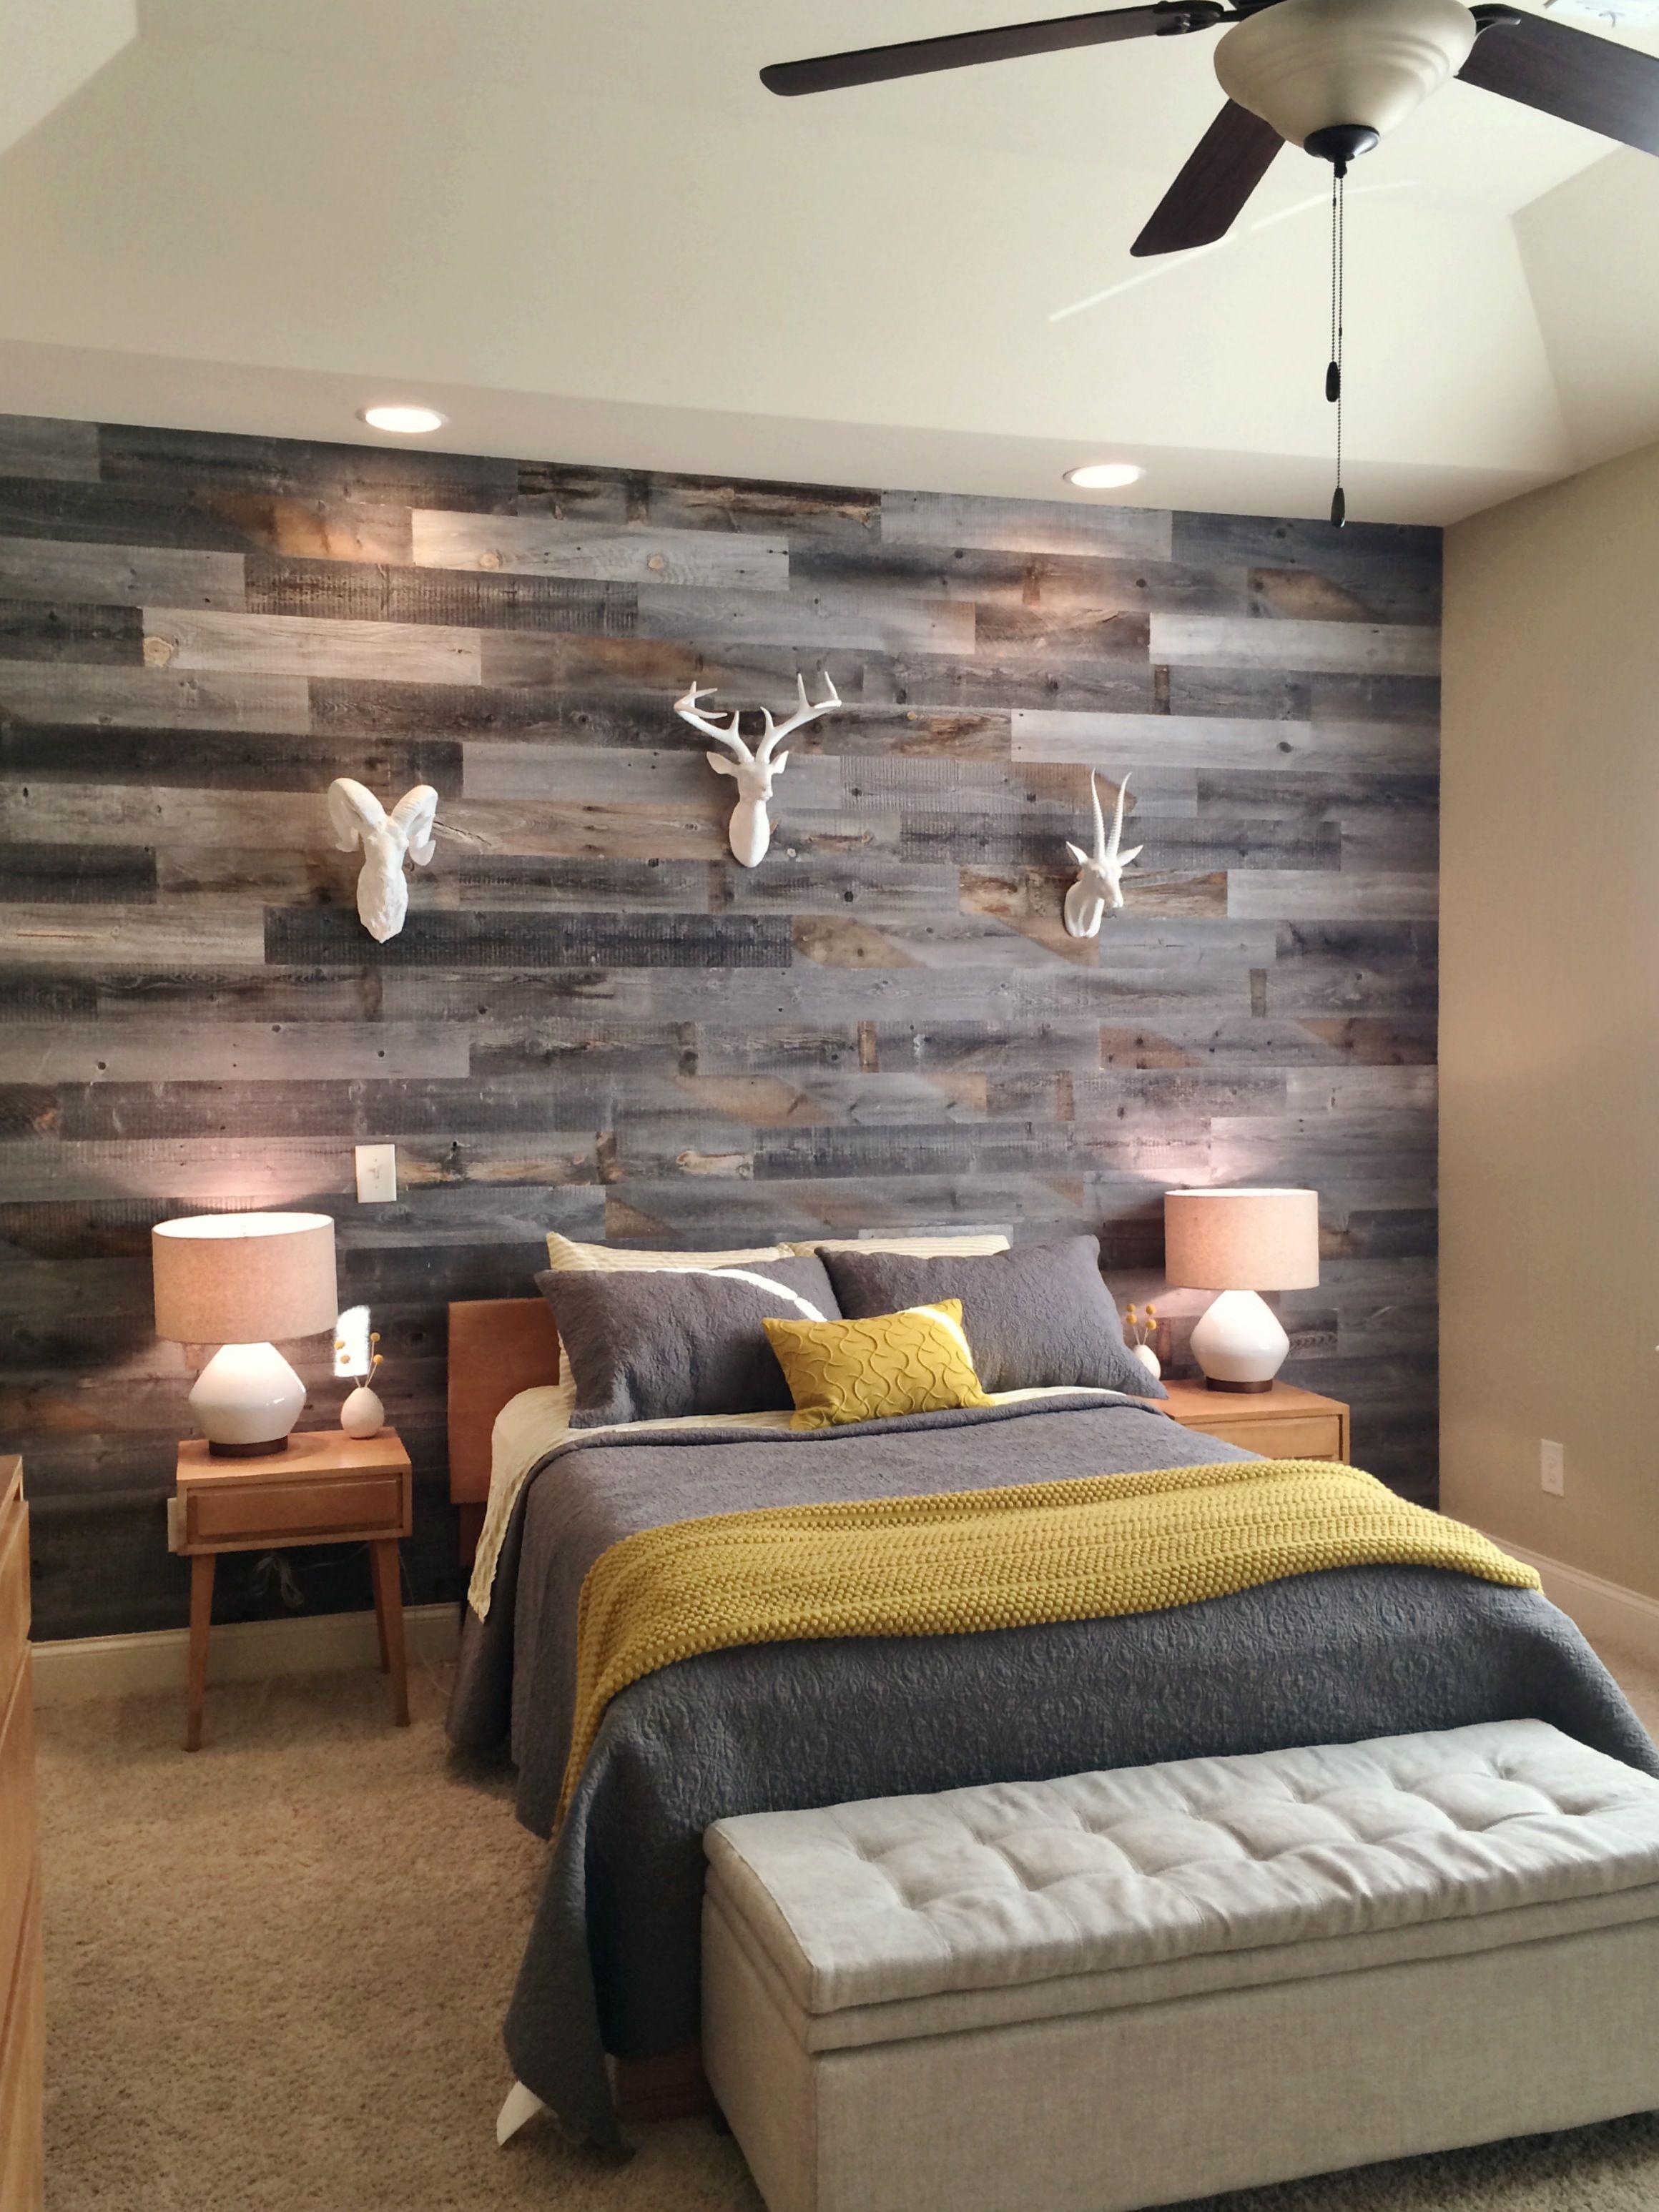 Reclaimed Weathered Wood Remodel Bedroom Rustic Bedroom Chic